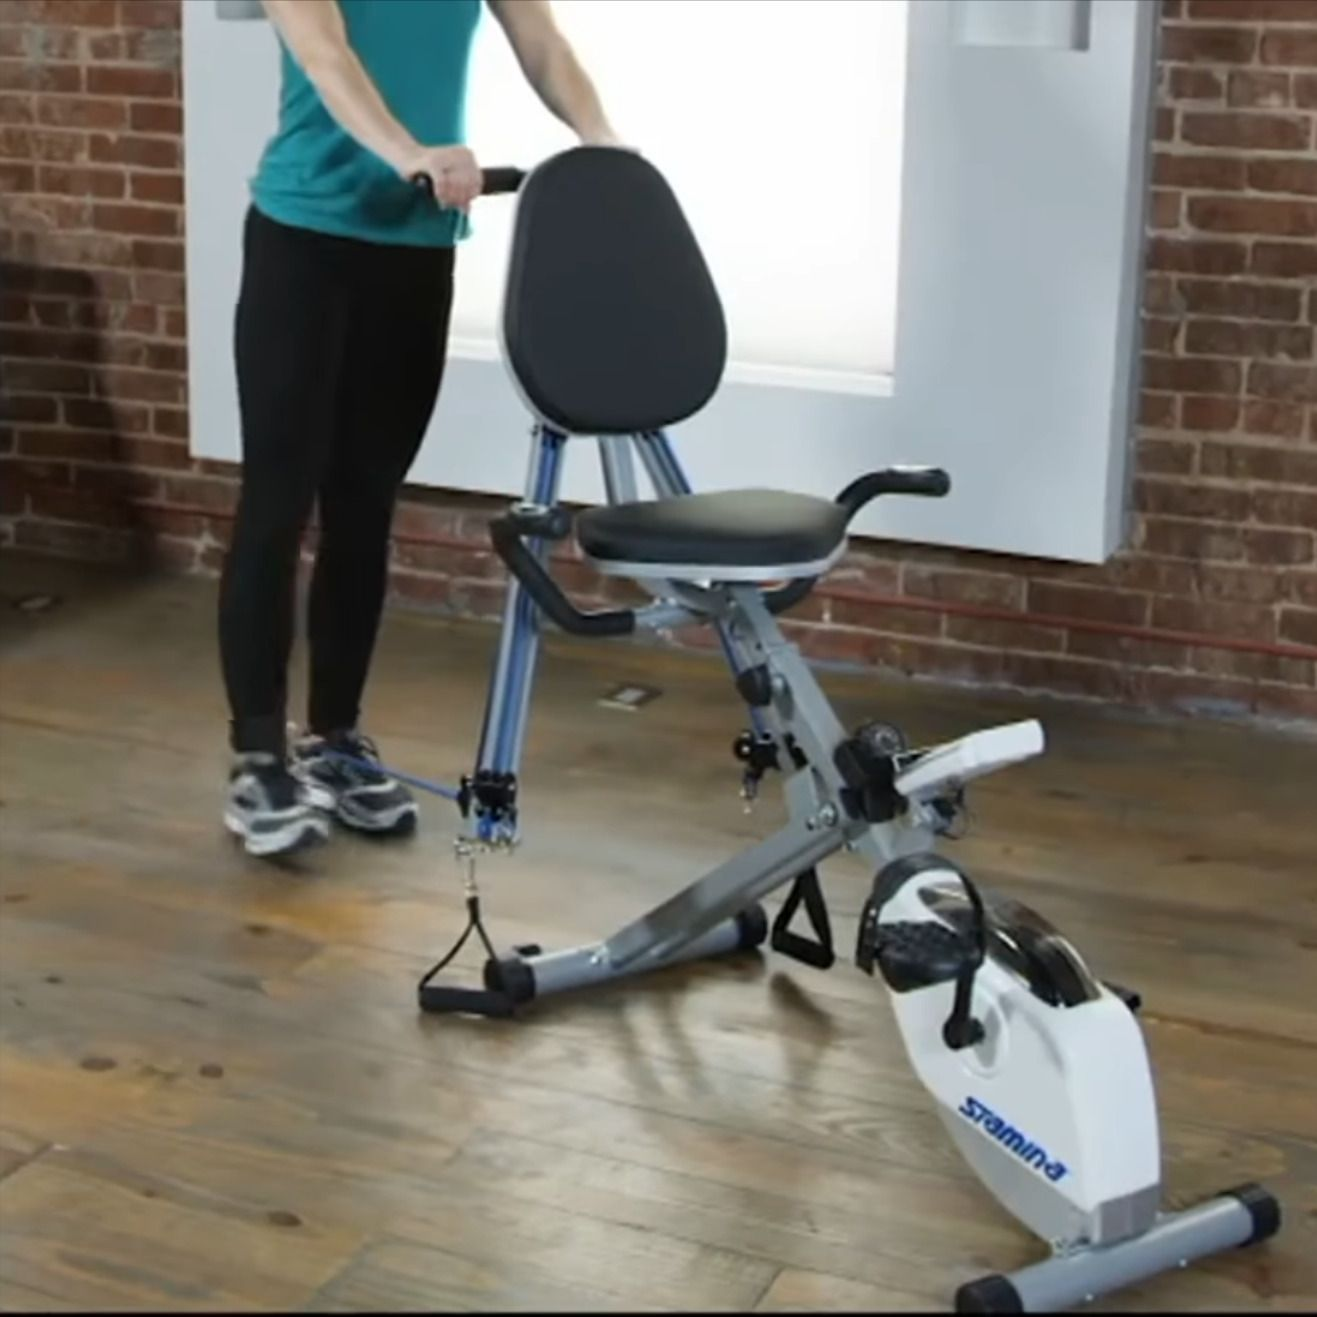 Intouch Fitness Monitor Recumbent Bike Workout Biking Workout Exercise Bikes